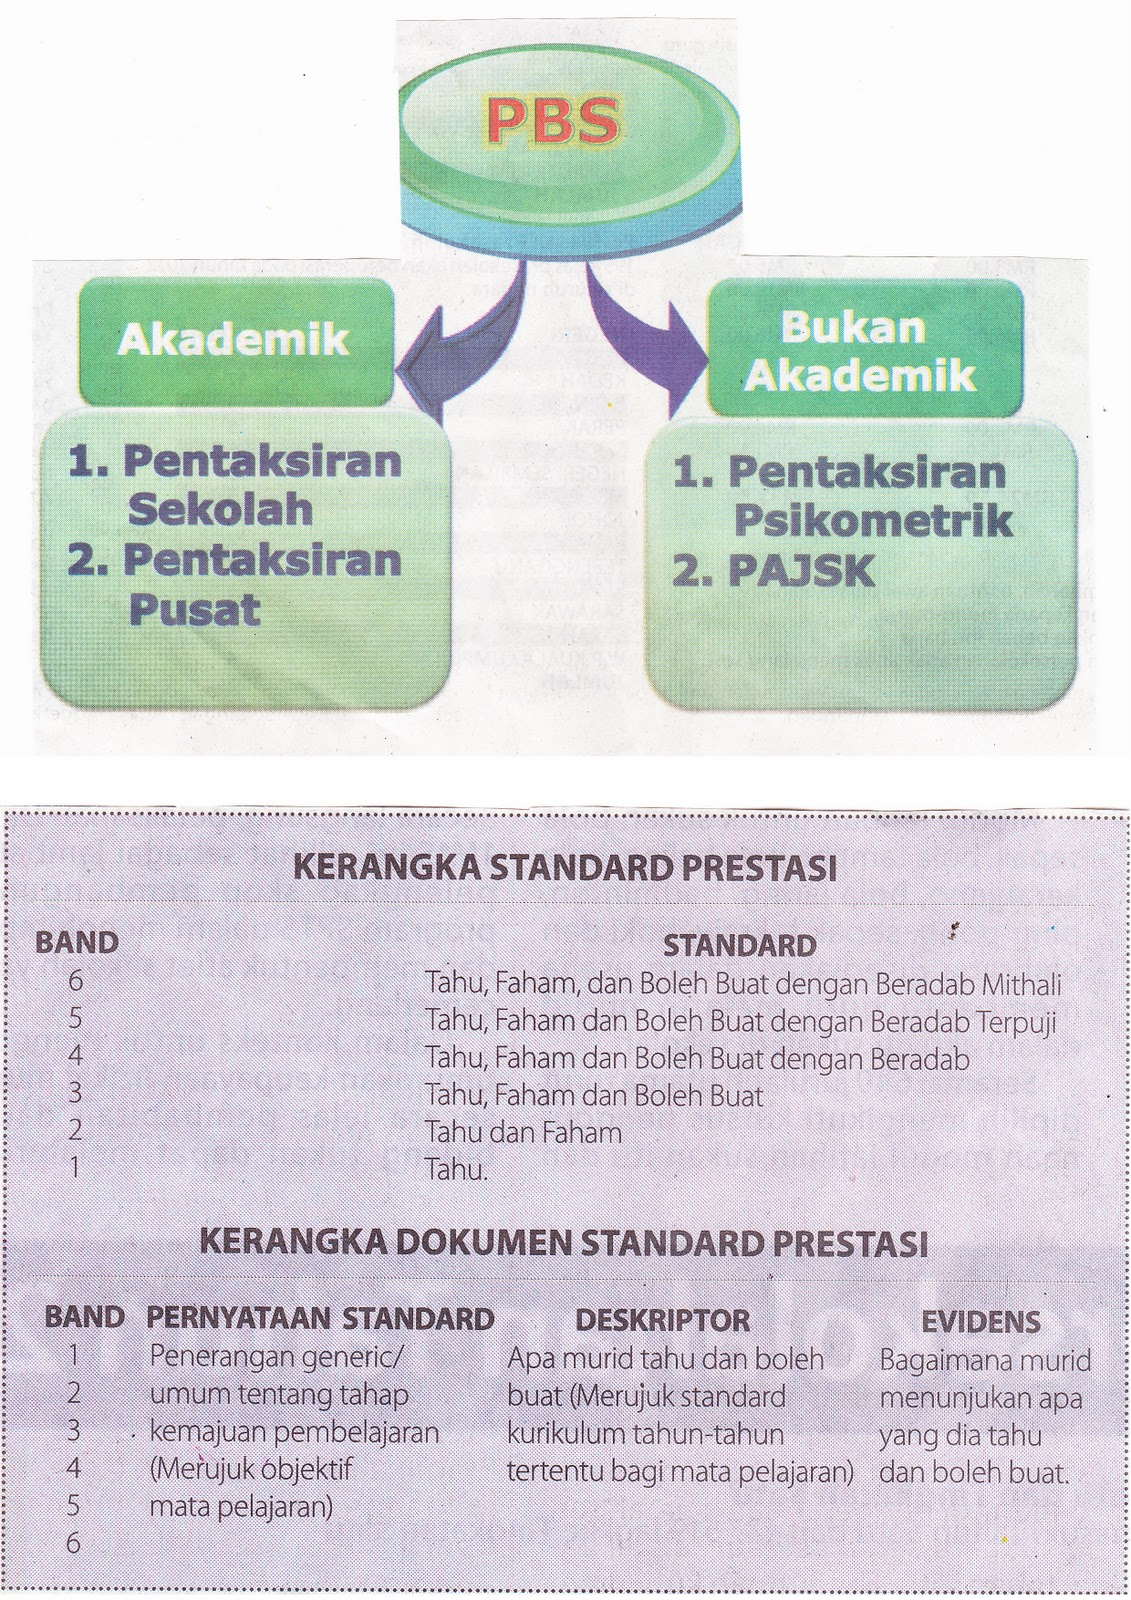 Kurikulum Standard Sekolah Menengah Kssm Mulai 2014 Kementerian